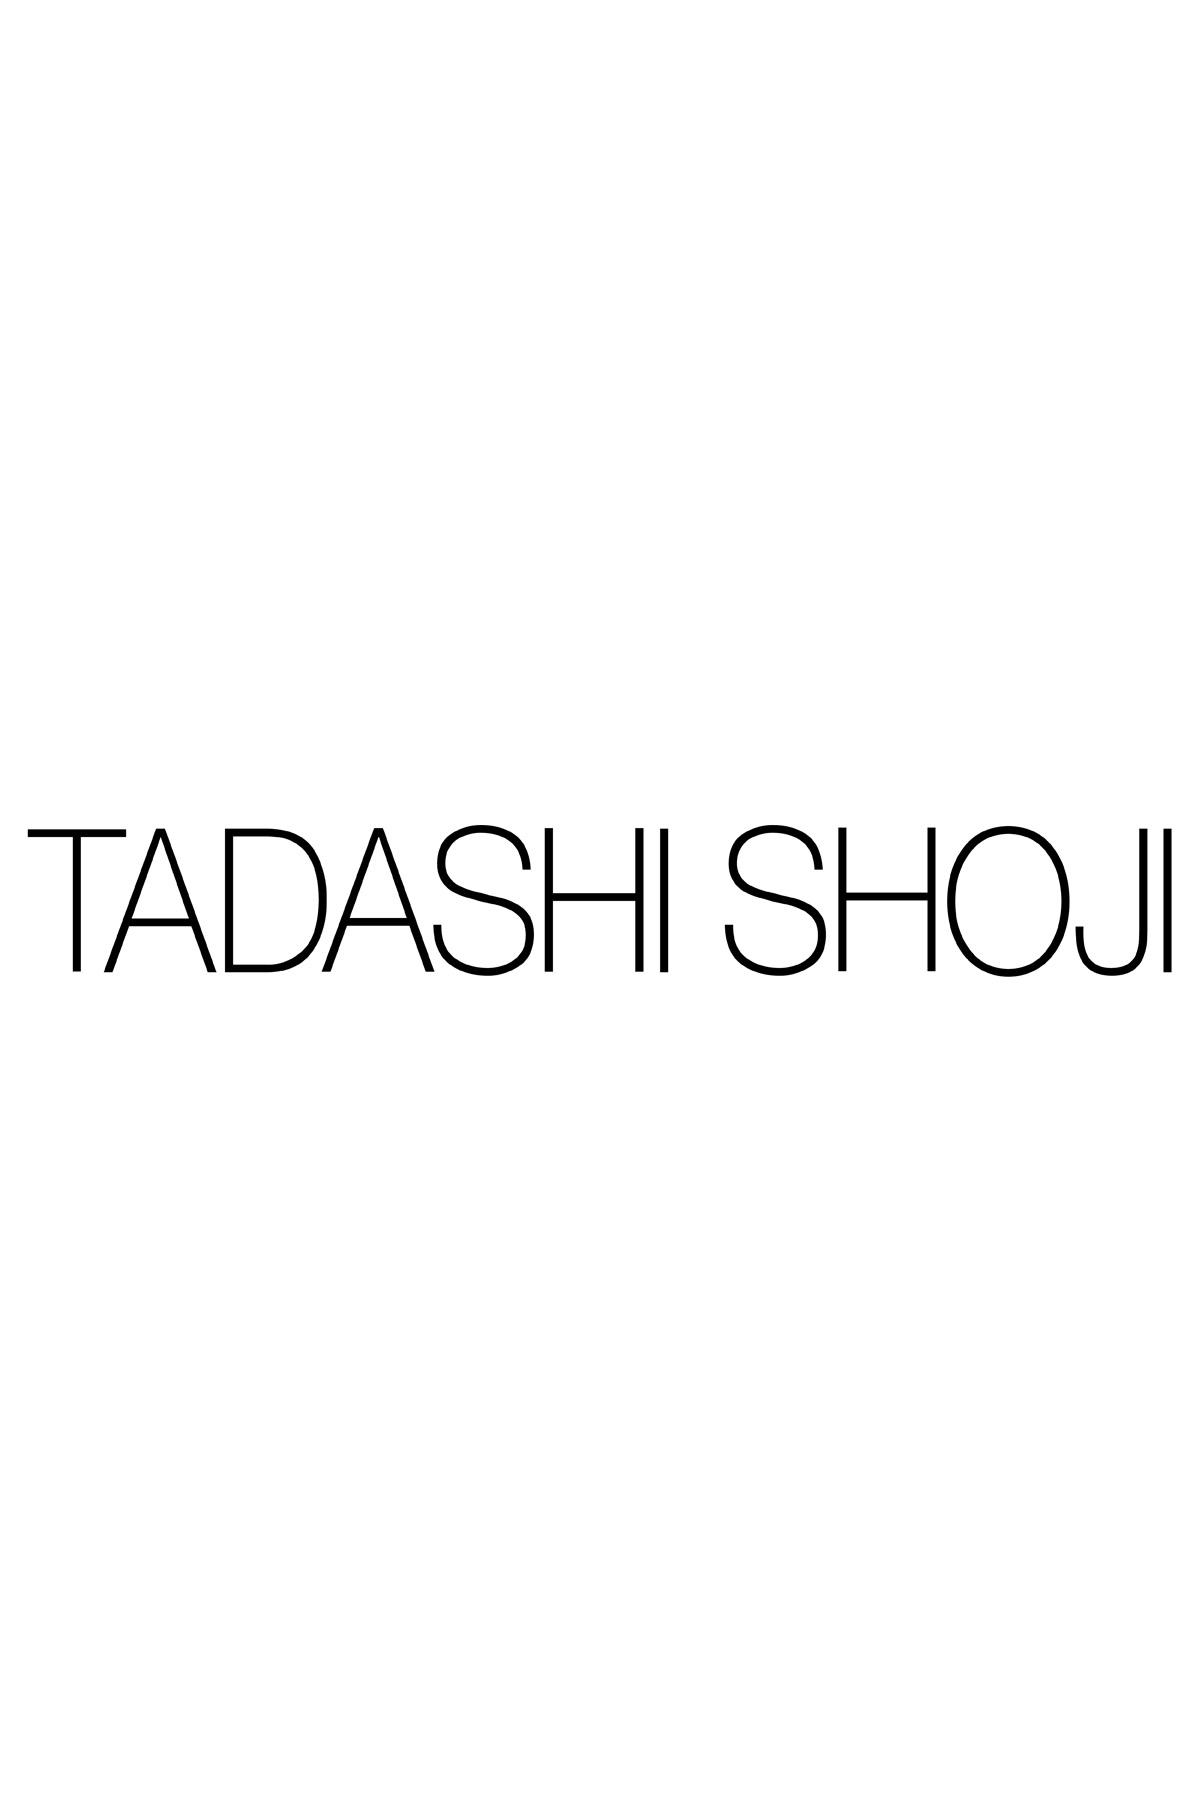 ebeda8c653233 ... Tadashi Shoji - Hamill Sequin Embroidered Dress